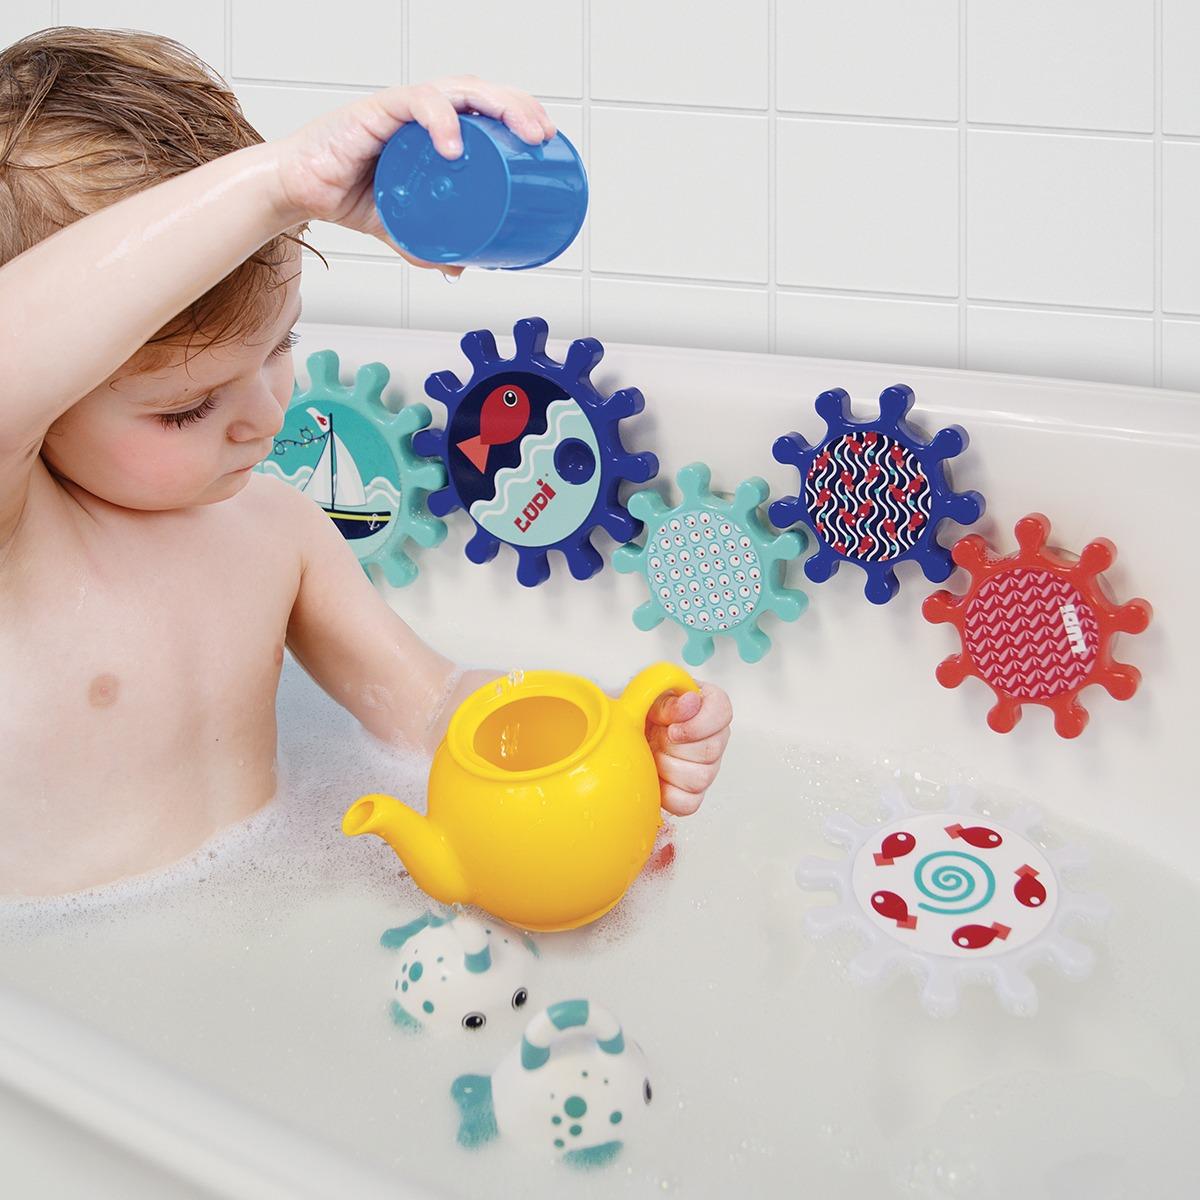 Bath gears